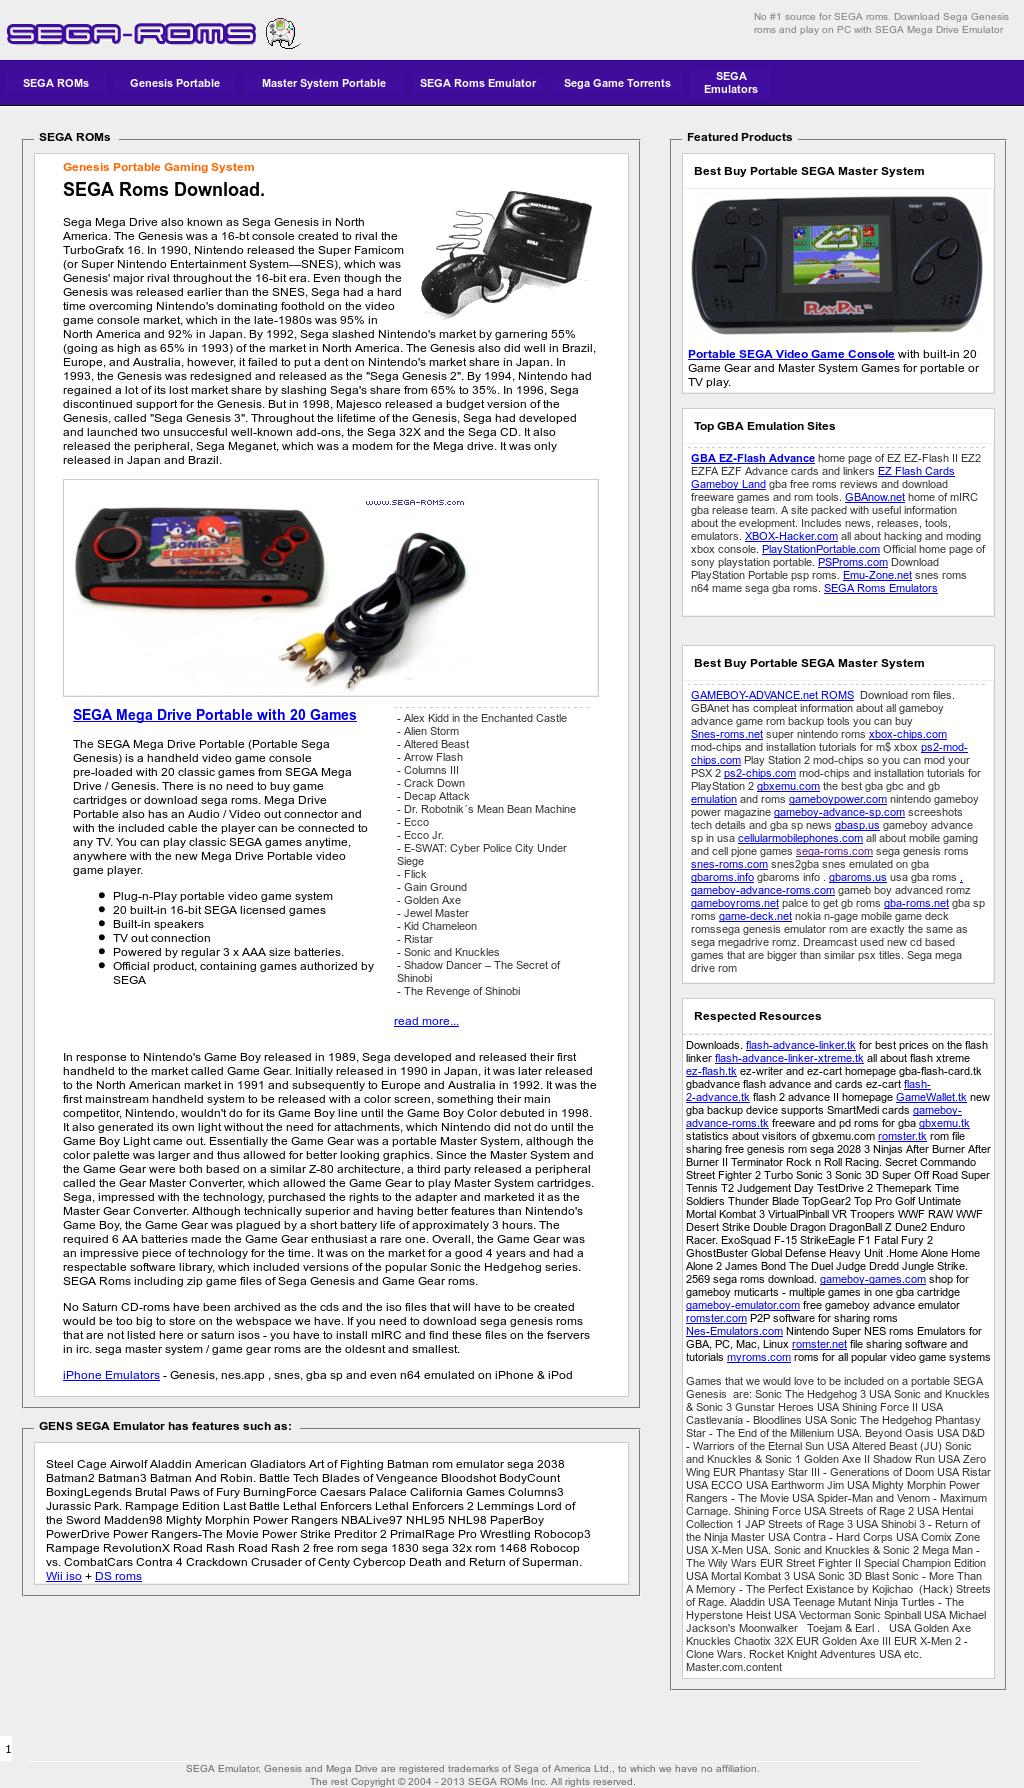 Sega Roms Competitors, Revenue and Employees - Owler Company Profile